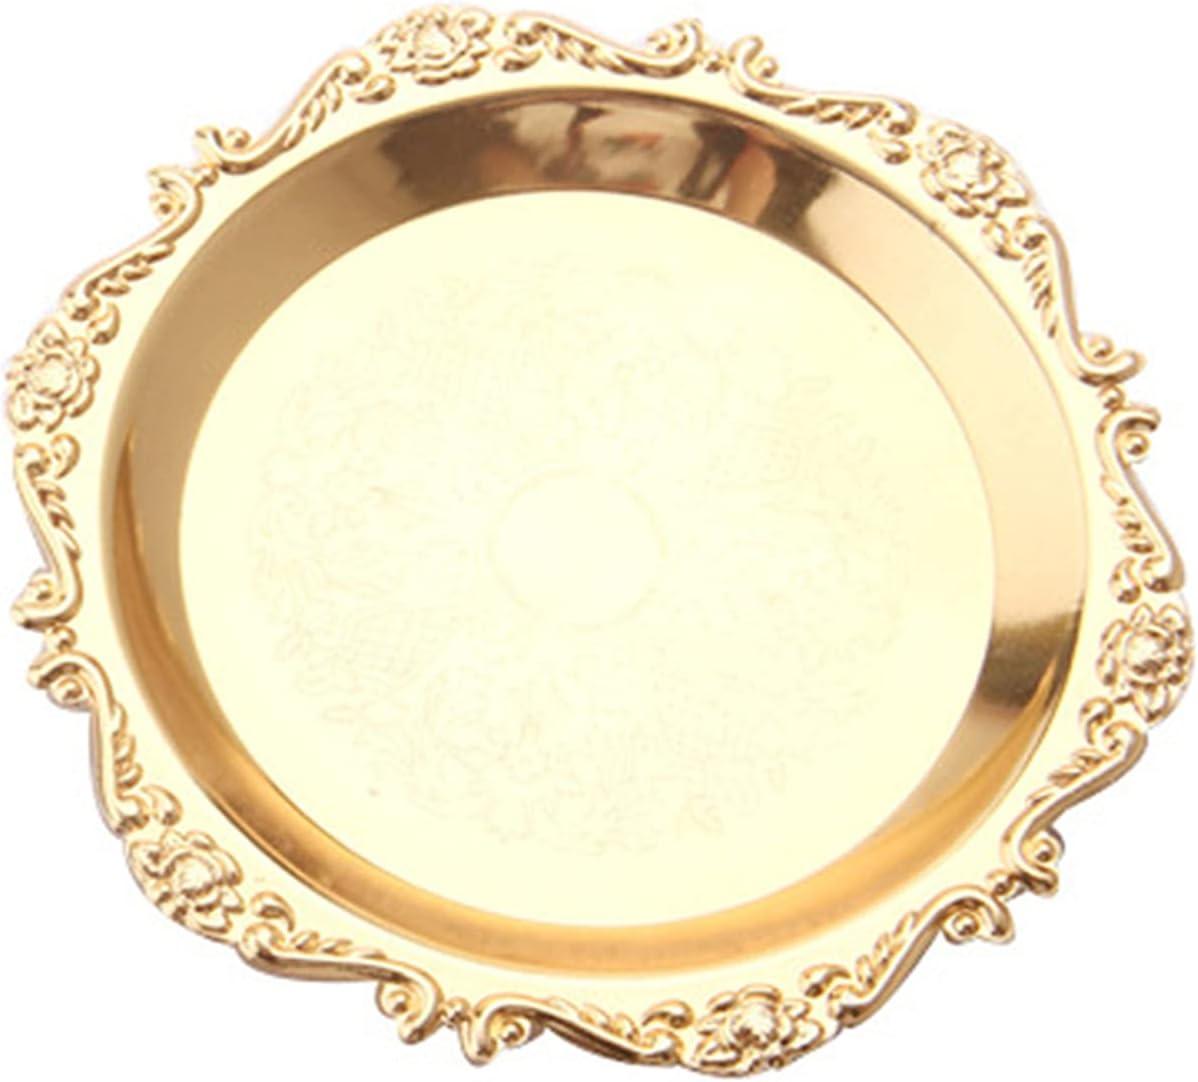 Serving Tray Dessert Platters Ultra-Cheap Deals Direct sale of manufacturer Storage Decorative Cake